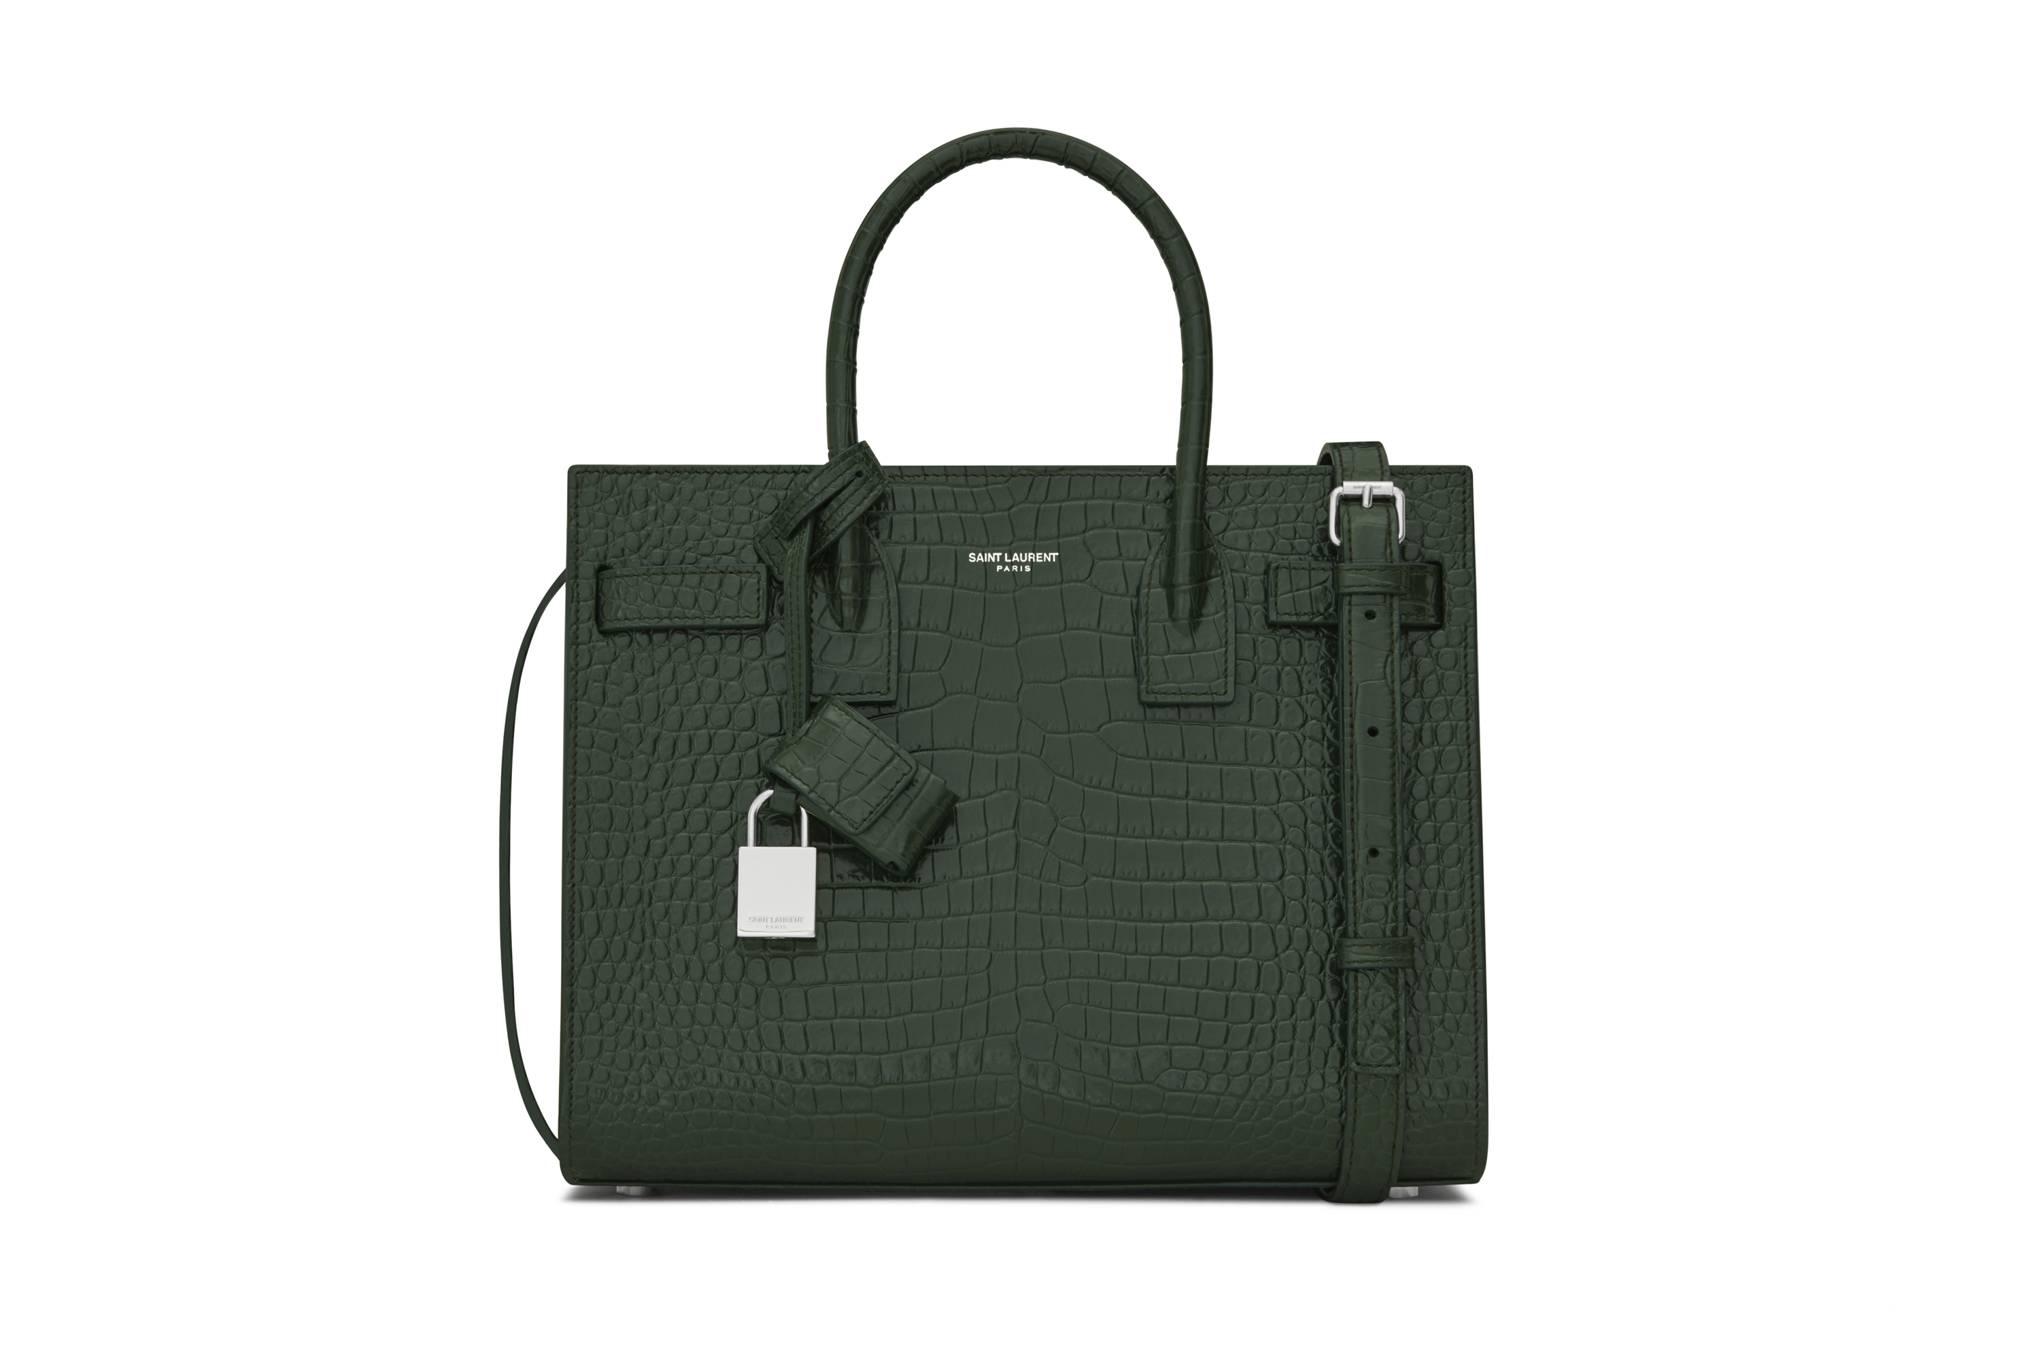 ec468afbf541 Best Top-Handle Bags 2017 | British Vogue